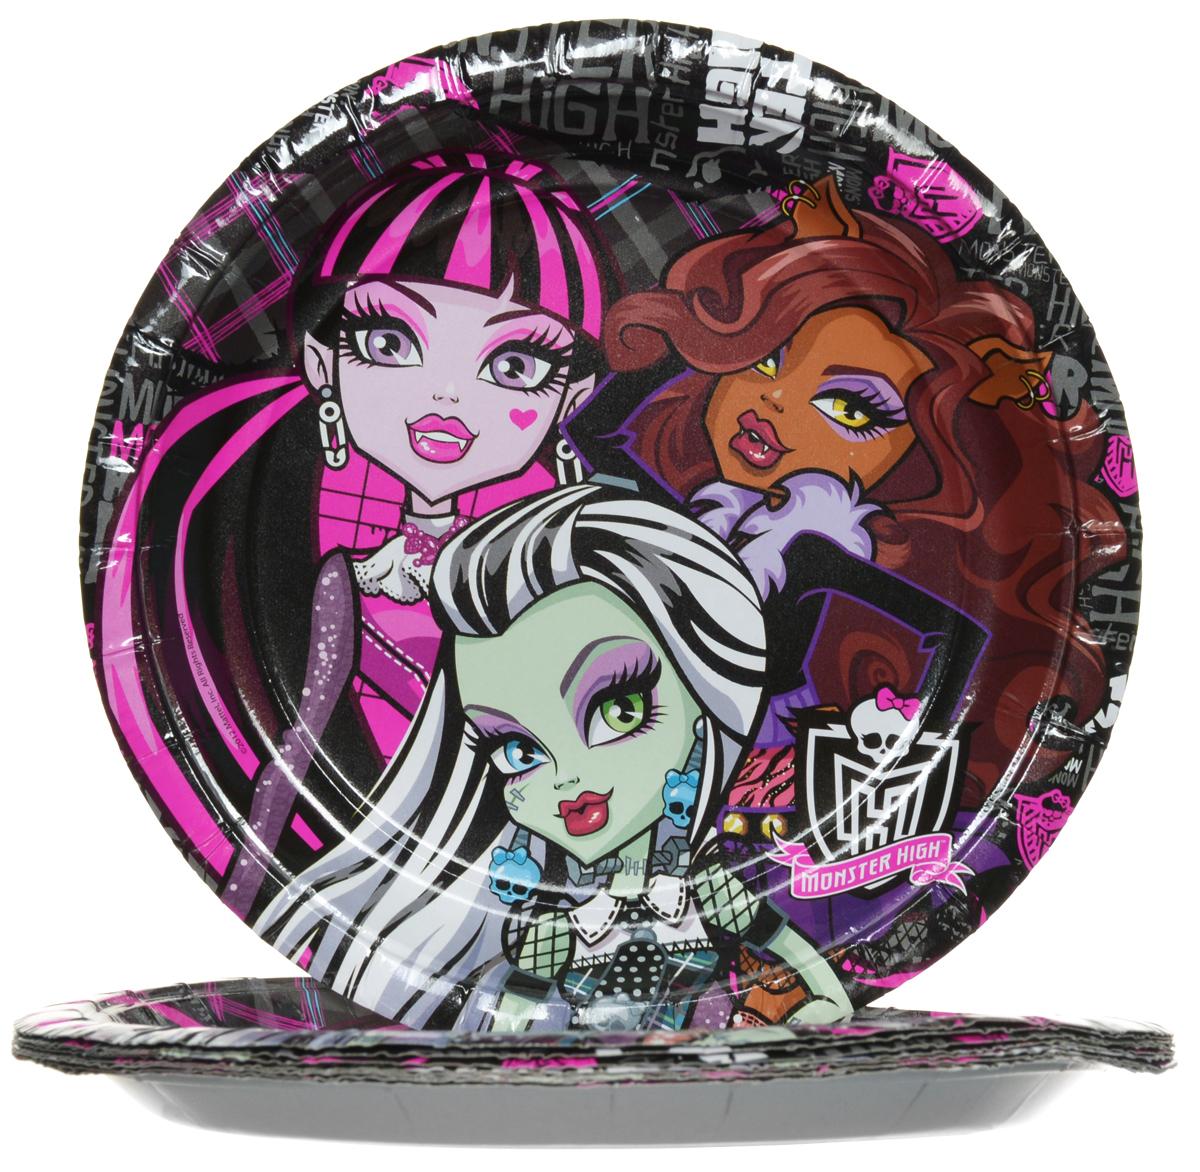 Monster High Набор одноразовых тарелок диаметр 18 см 10 шт, Росмэн